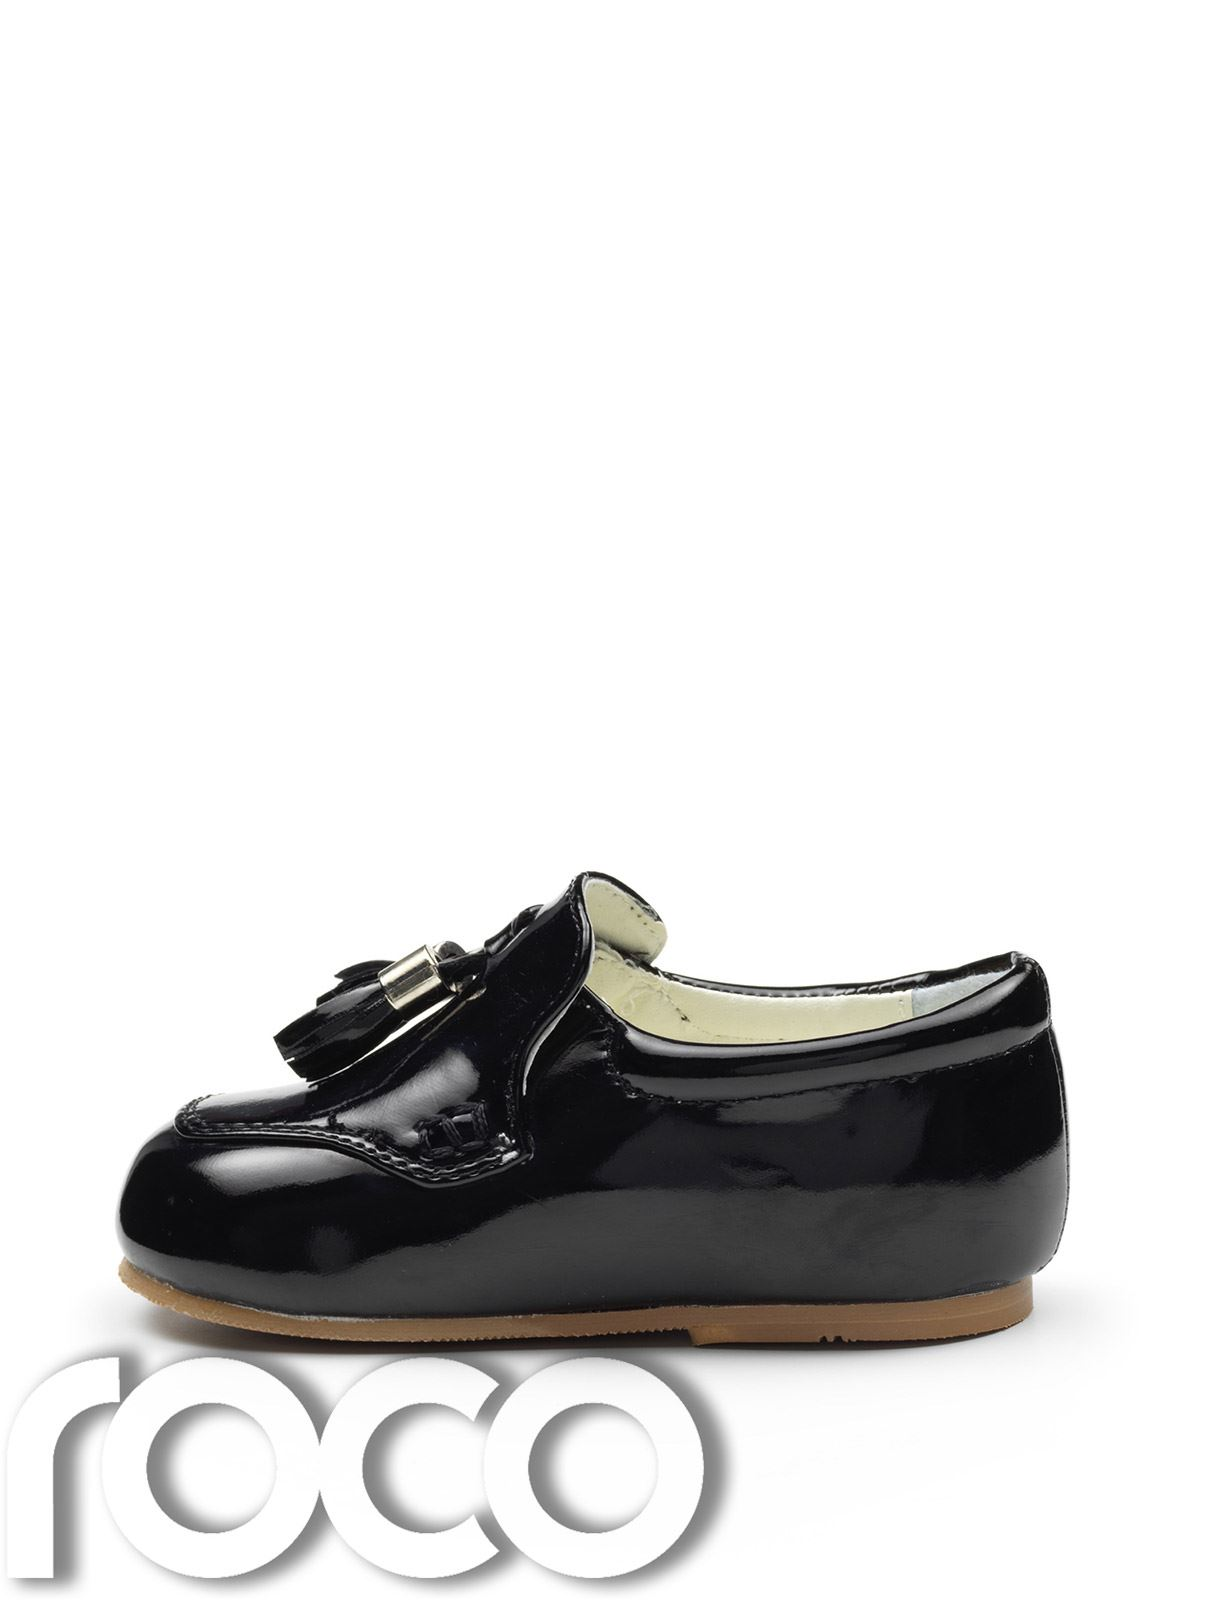 Boys Slip Shoes Boys Loafers Kids Shoes Boys Dress